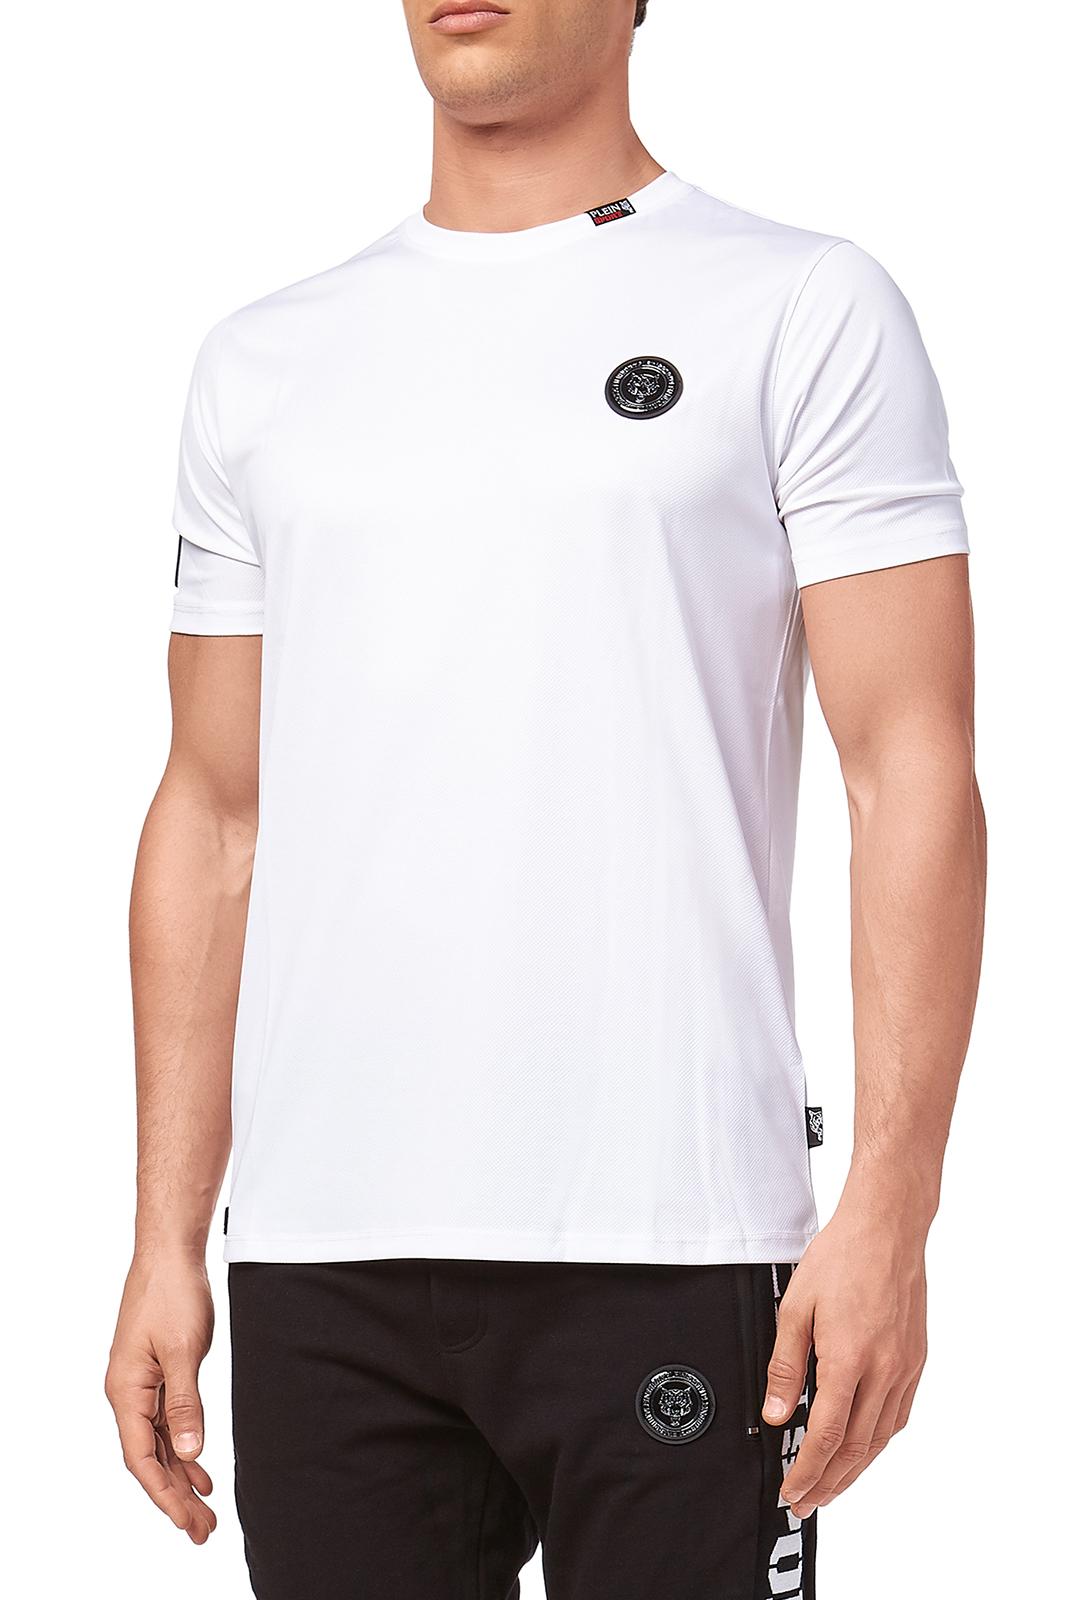 Tee-shirts  Plein Sport MTK2108 LUKA 01 WHITE